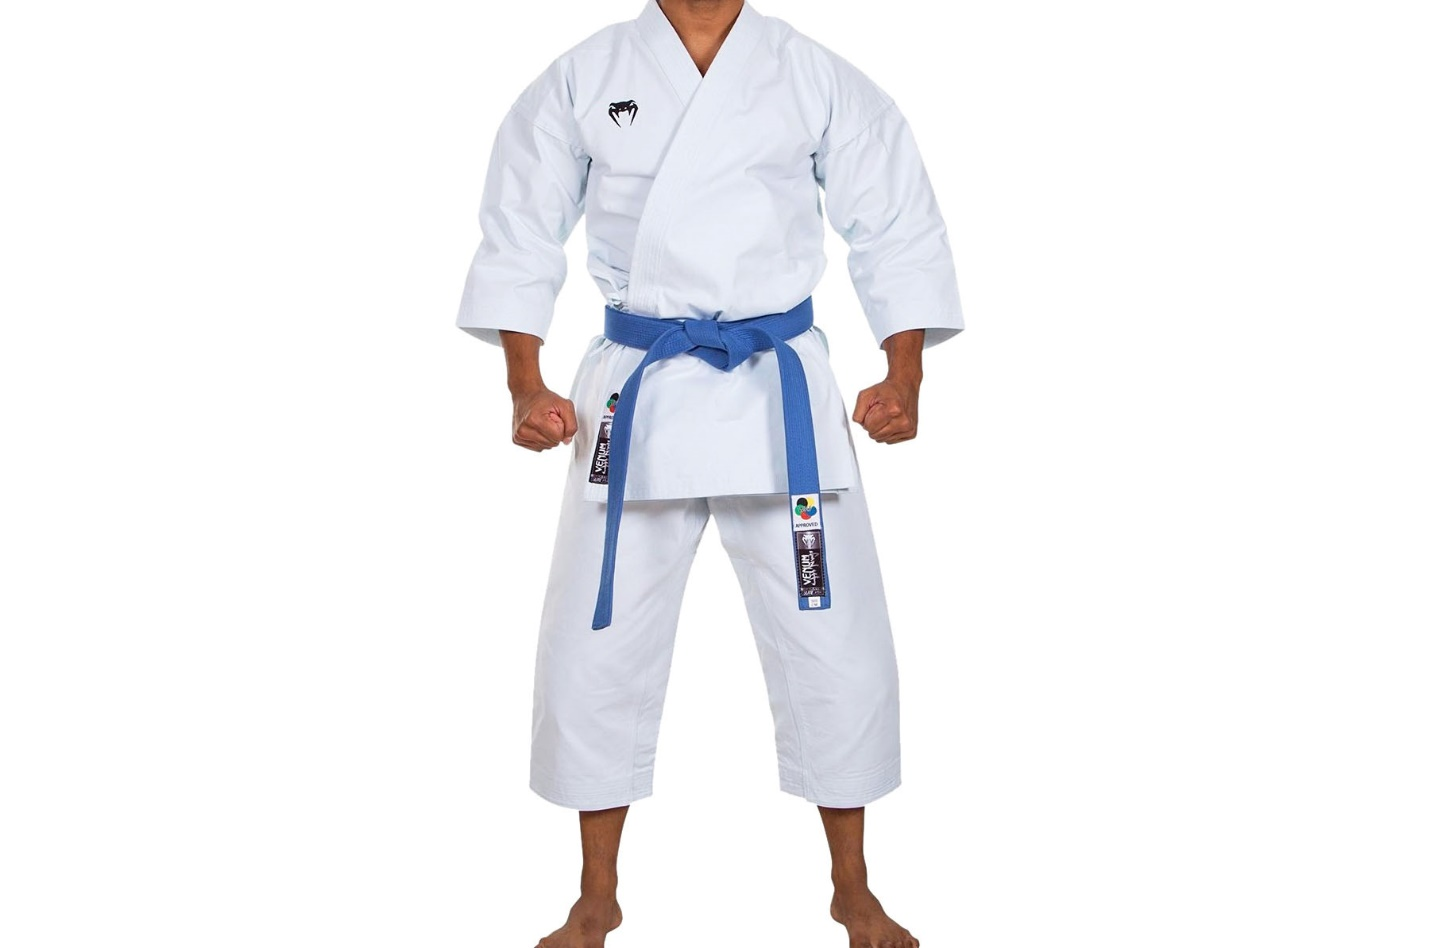 https://www.dragonsports.eu/391801-verylarge_default/venum-elite-kata-karate-gi.jpg